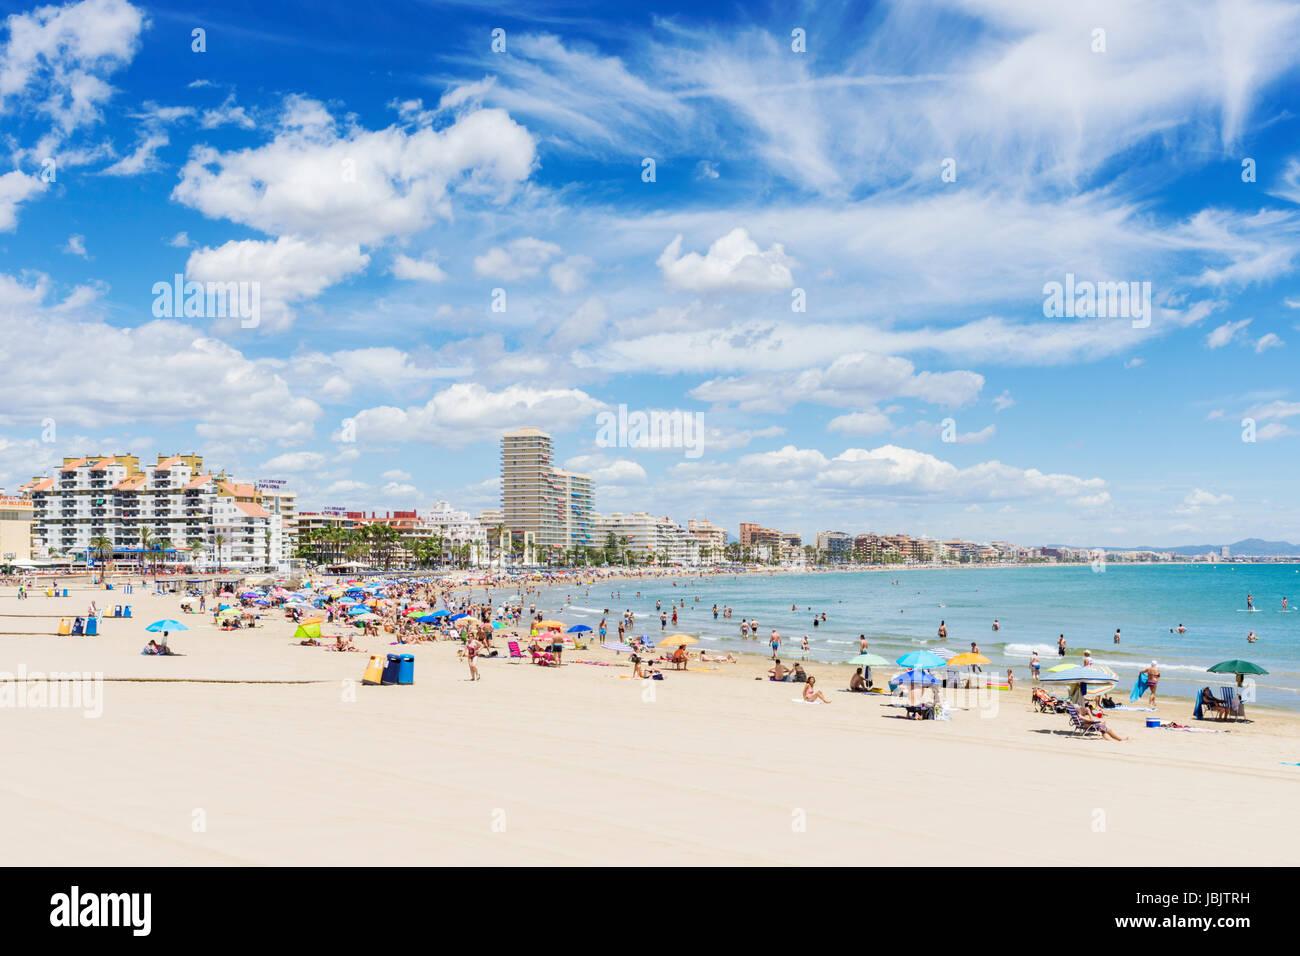 Costa del Azahar plage de Playa Norte, dans le complexe de vacances espagnol ville de Peniscola, Castellon, Espagne Photo Stock